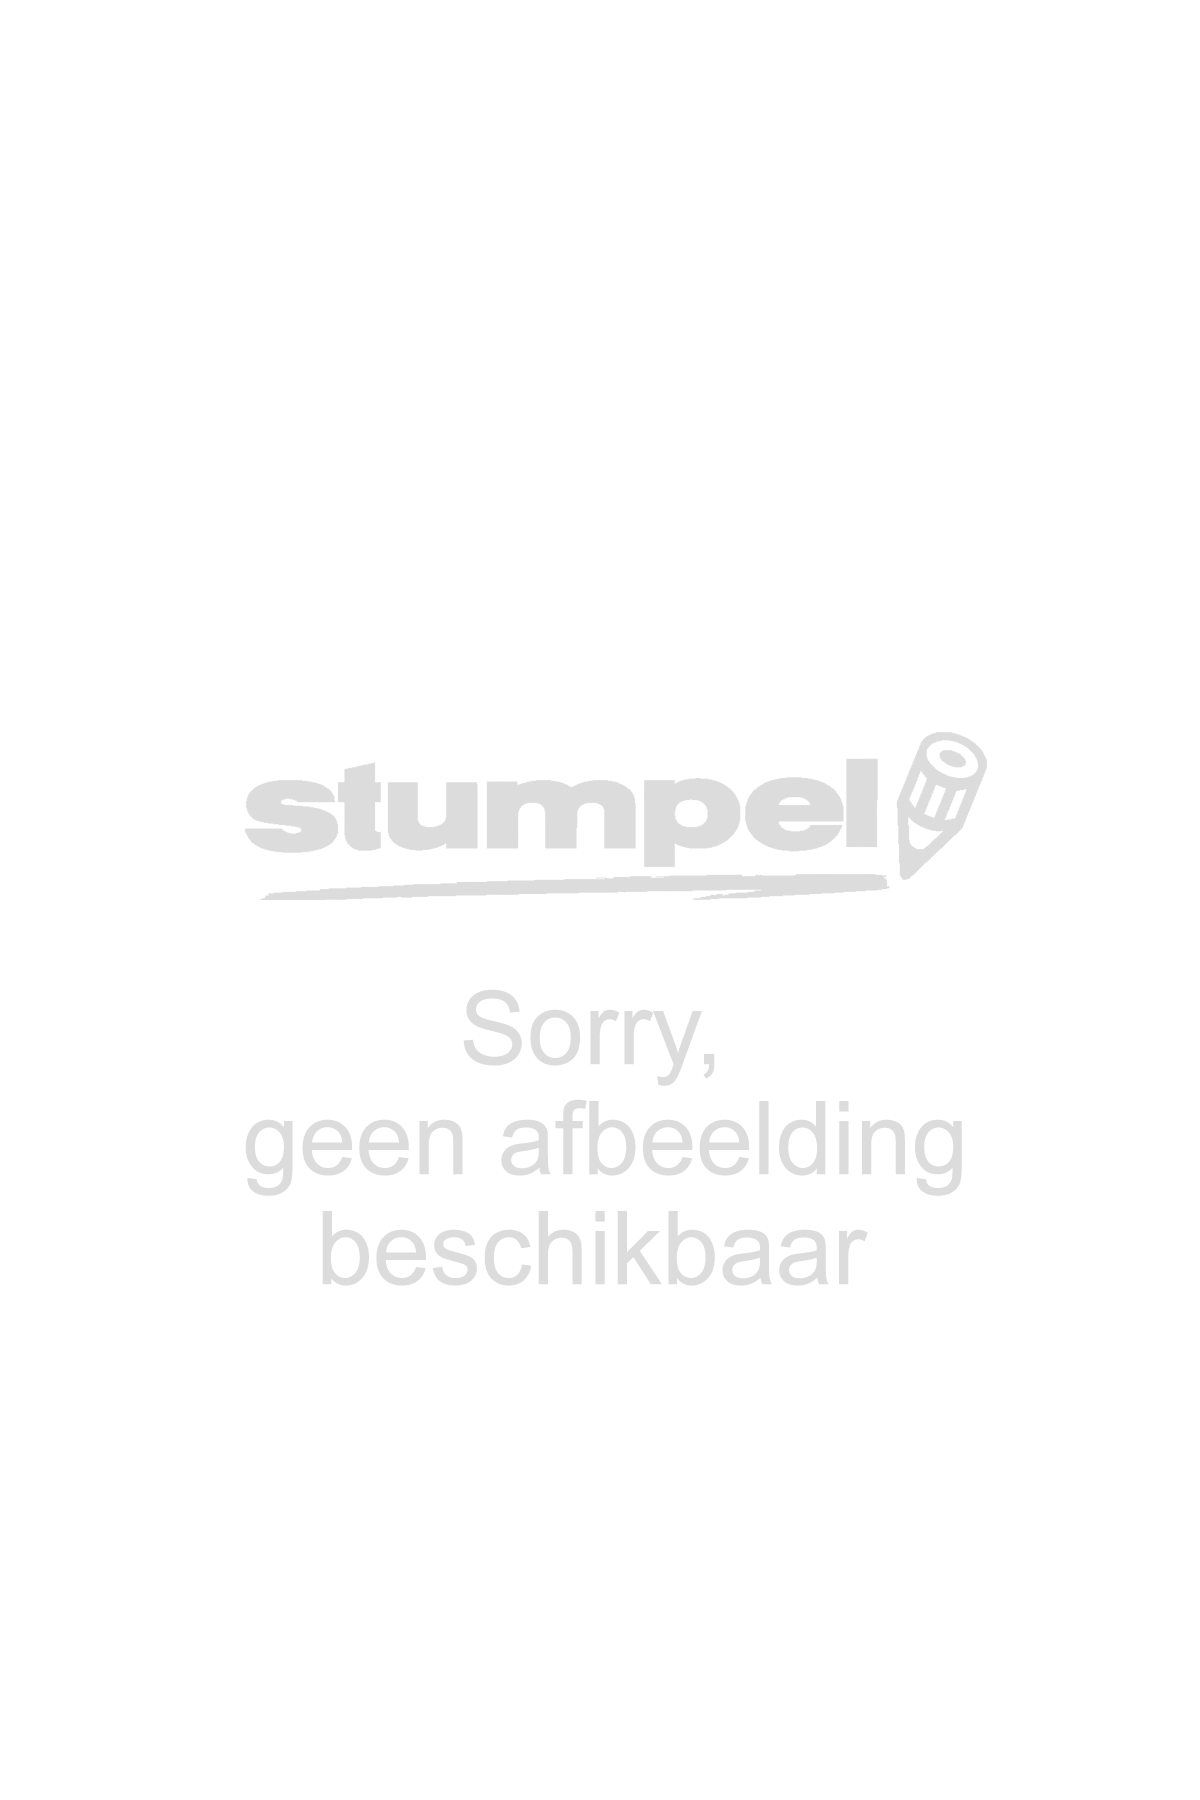 viltstift-edding-3000-rond-zwart-1-5-3mm-630001